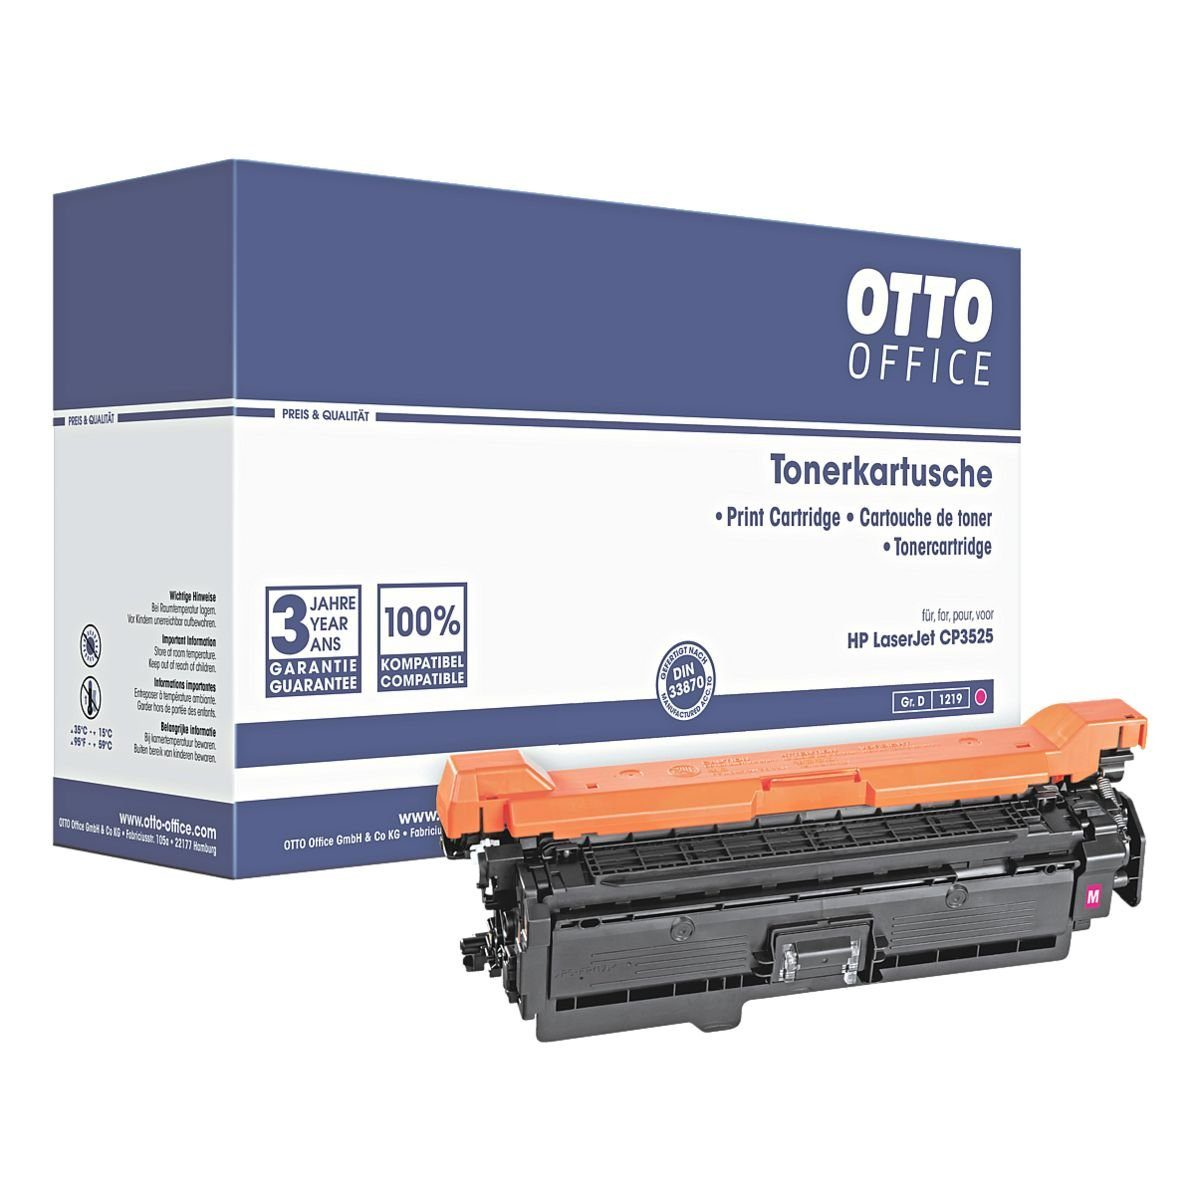 OTTO Office Toner ersetzt HP »CE253A« No. 504A